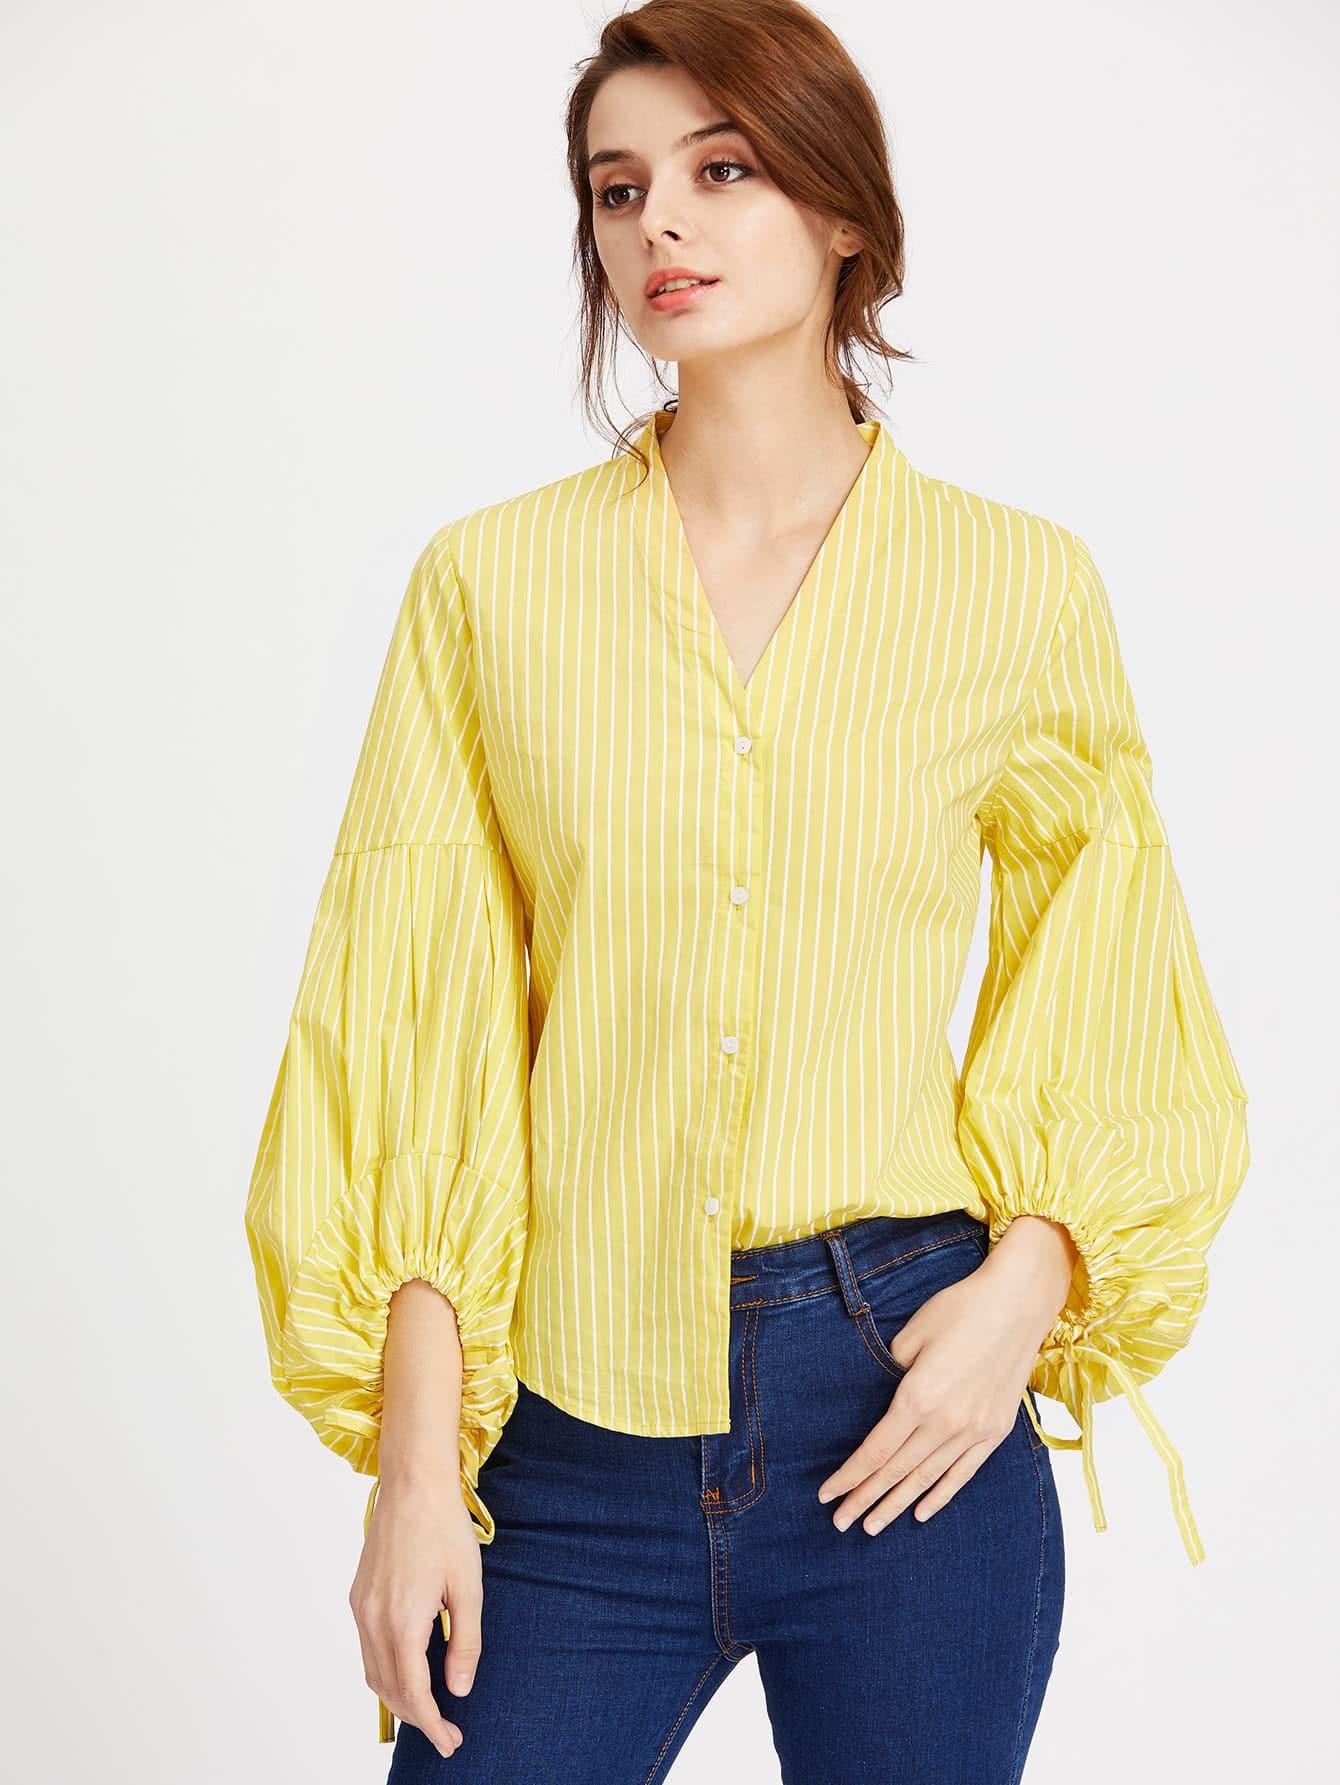 blouse170531101_2